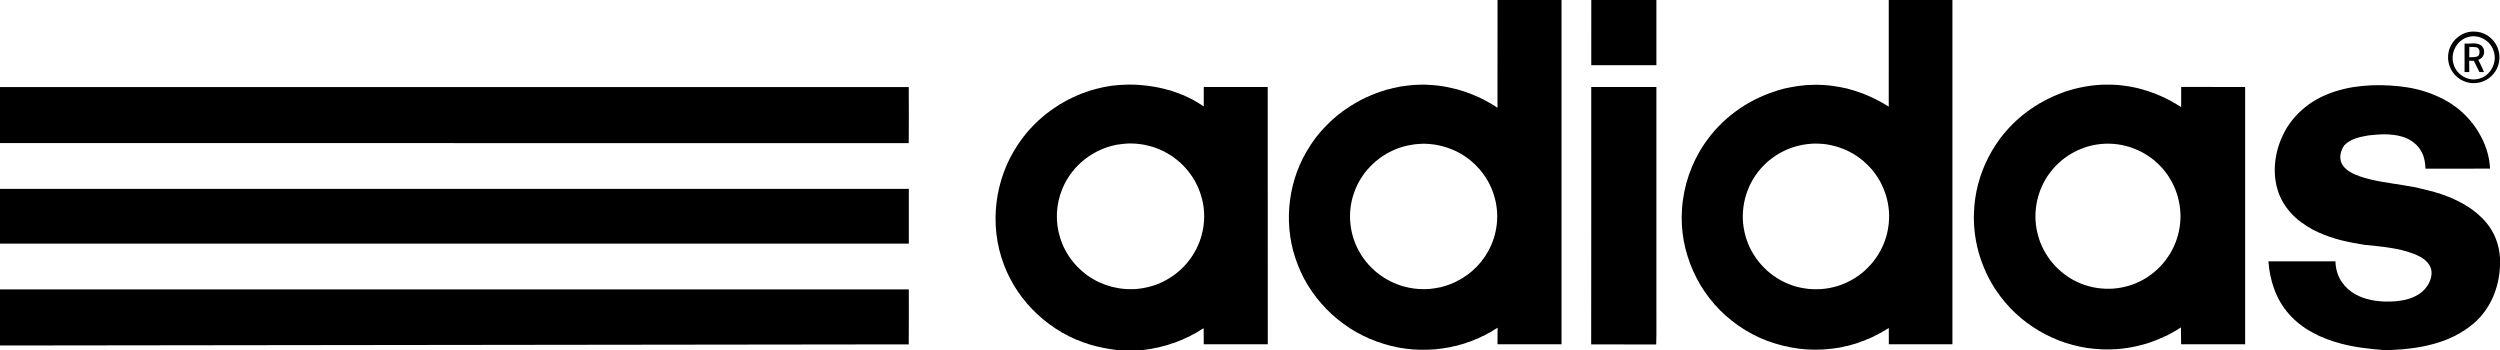 Adidas clipart transparent Image PNG logo logo transparent